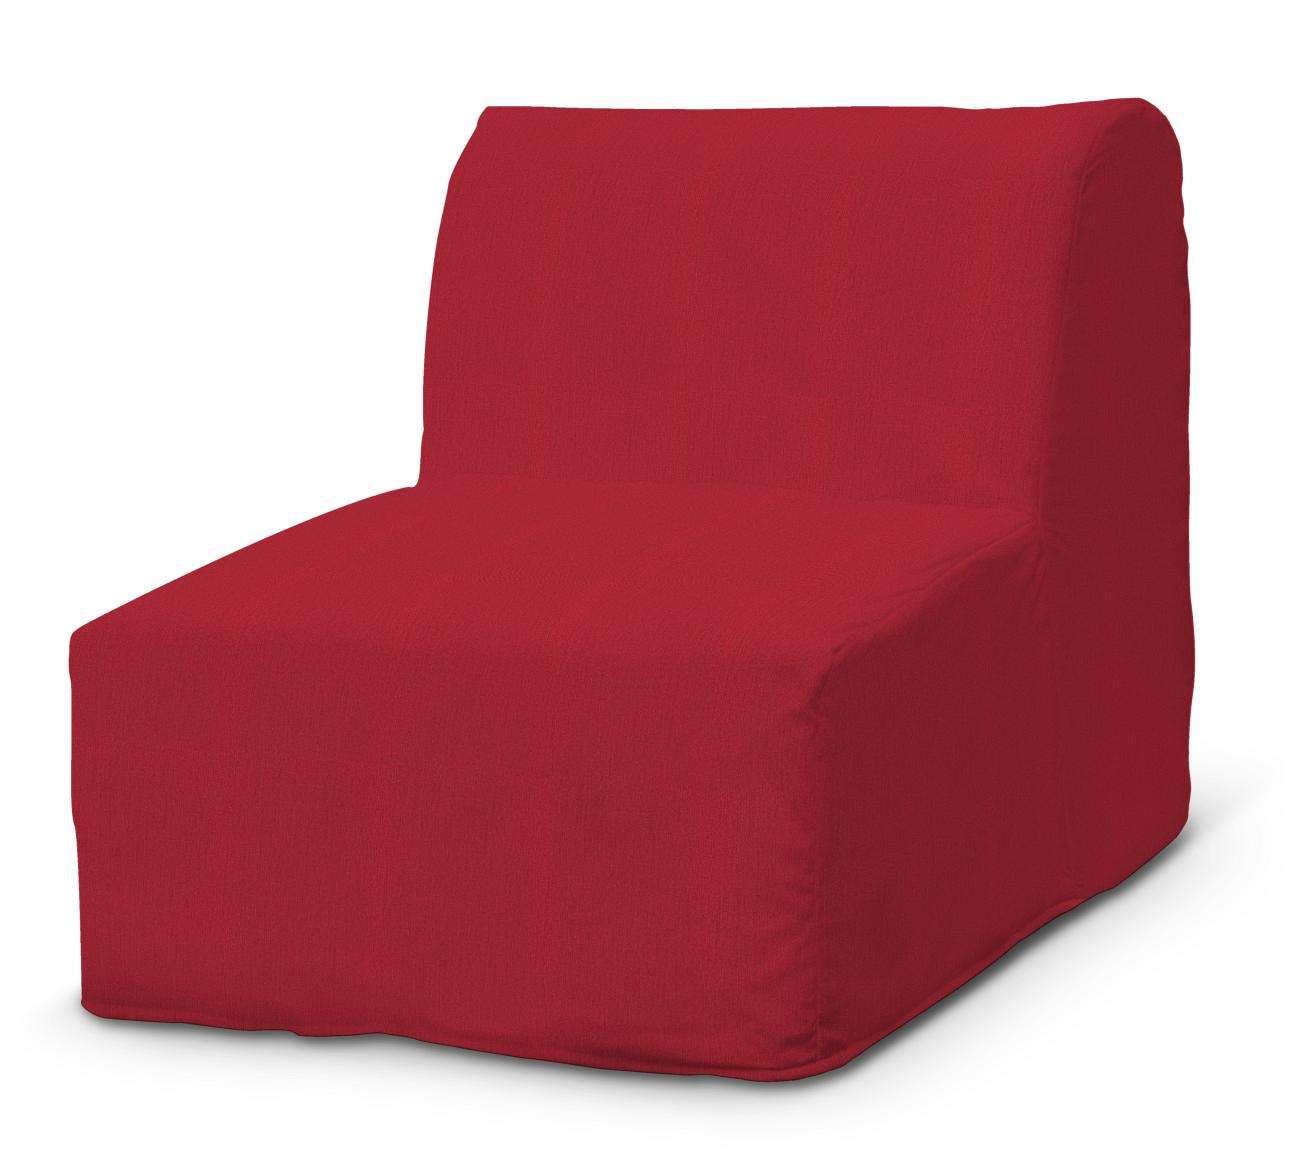 Lycksele Sesselbezug fotel Lycksele von der Kollektion Chenille , Stoff: 702-24